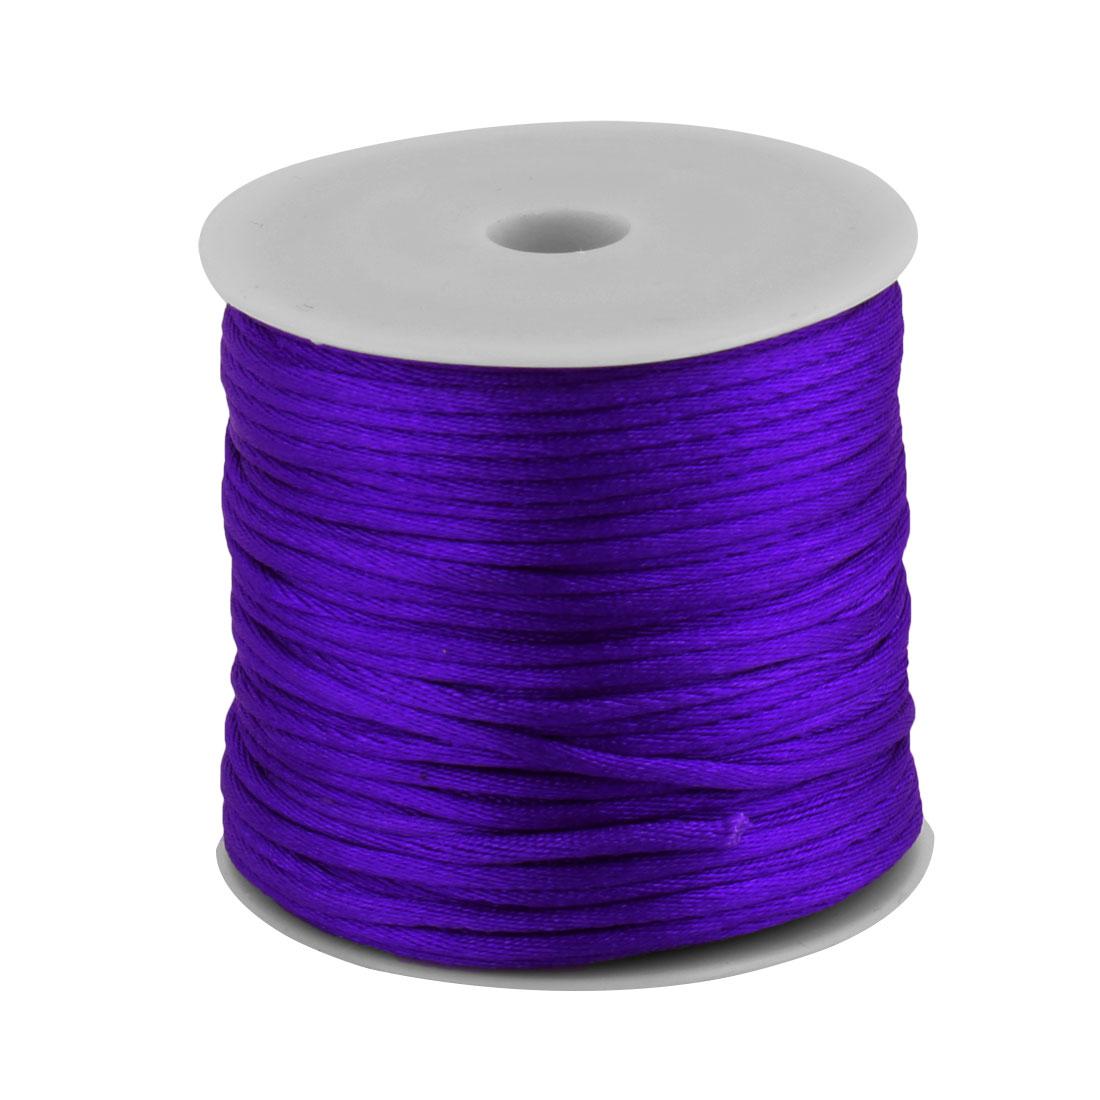 Nylon Handicraft DIY Knit Key Chains Doll Pendant Cord Purple 2mm Dia 49 Yards